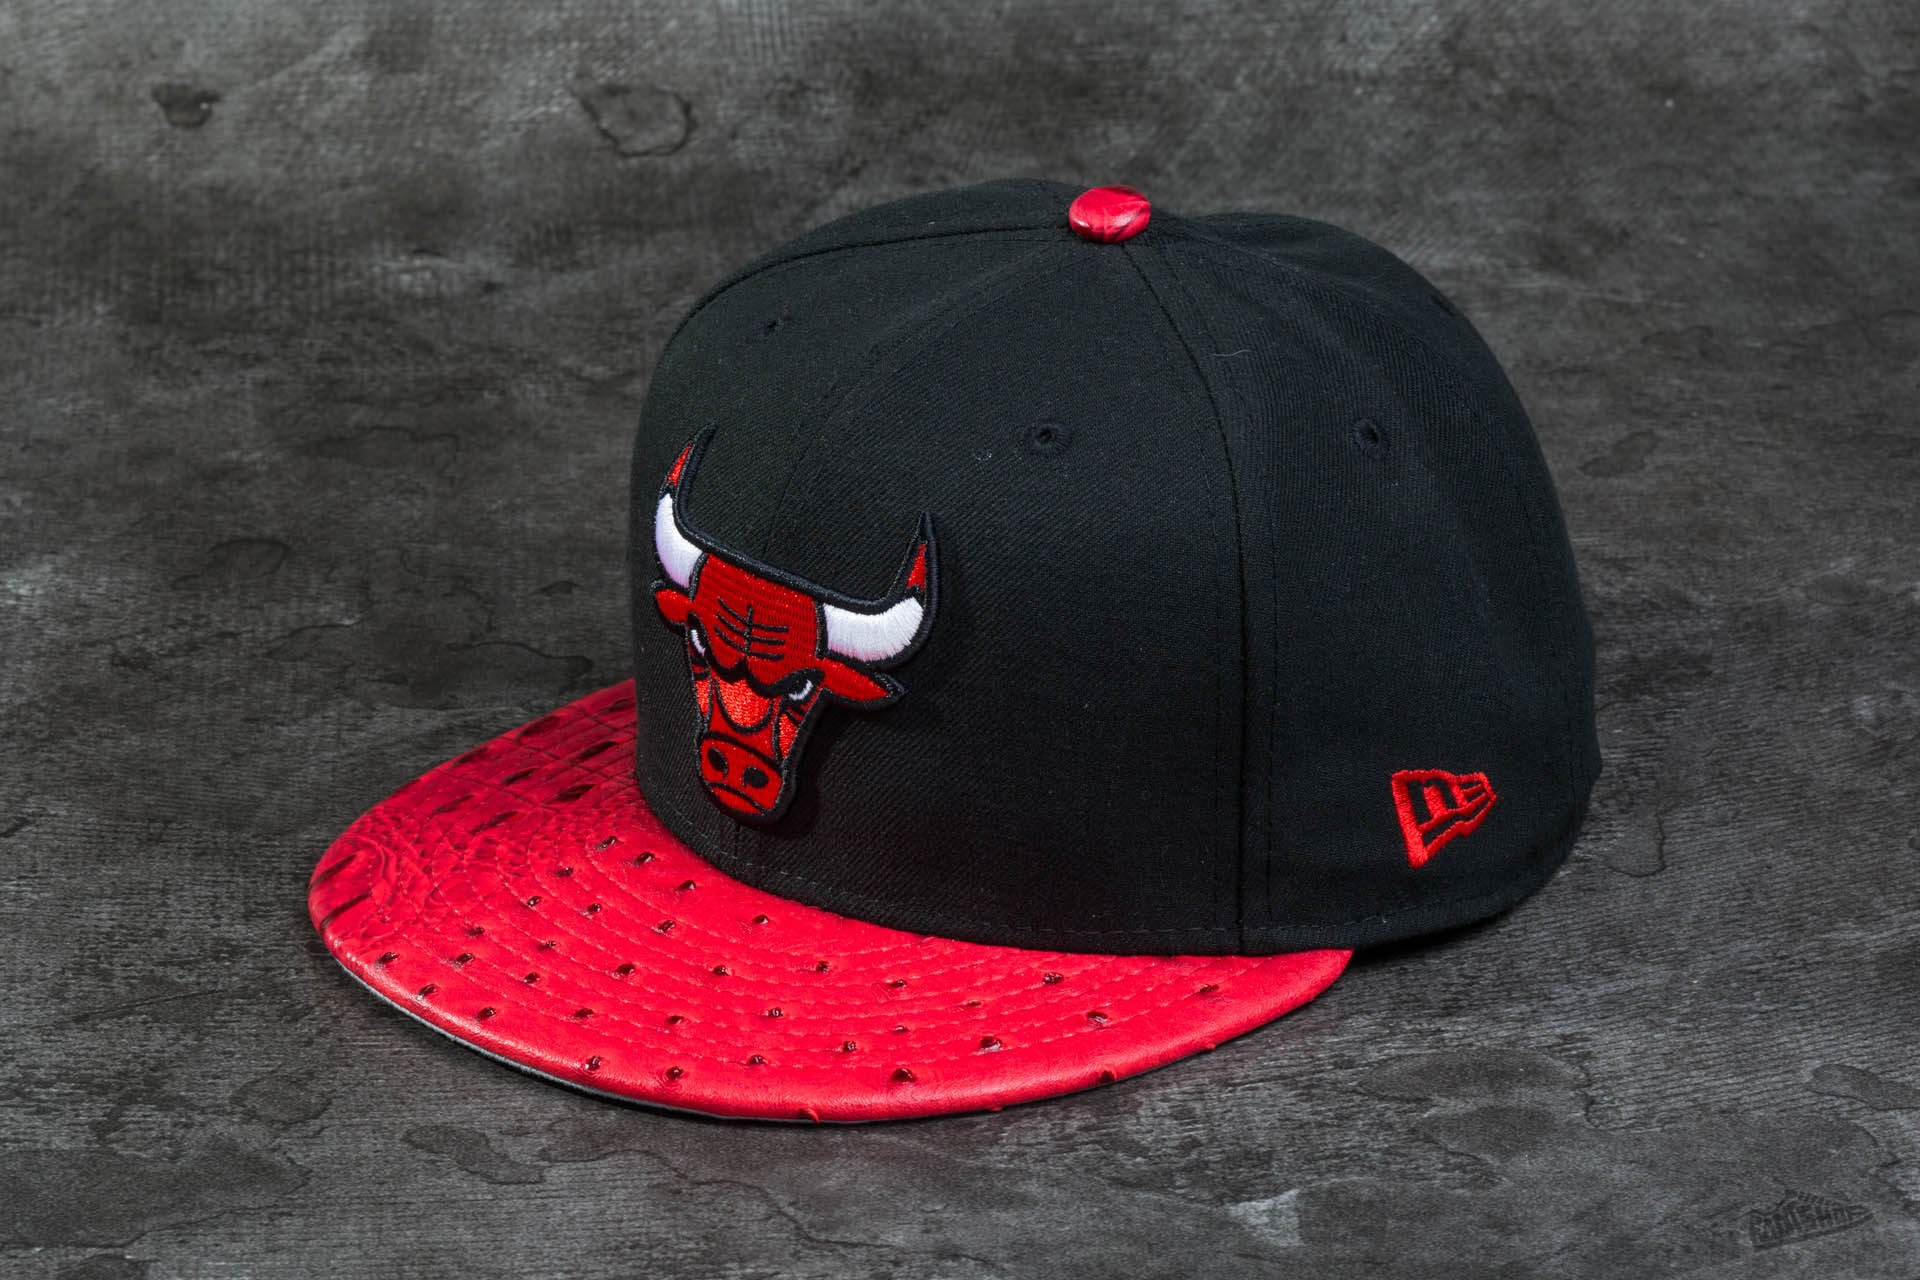 New Era 59FIFTY Reptile Mix Chicago Bulls Black Red  5ece83d1da4